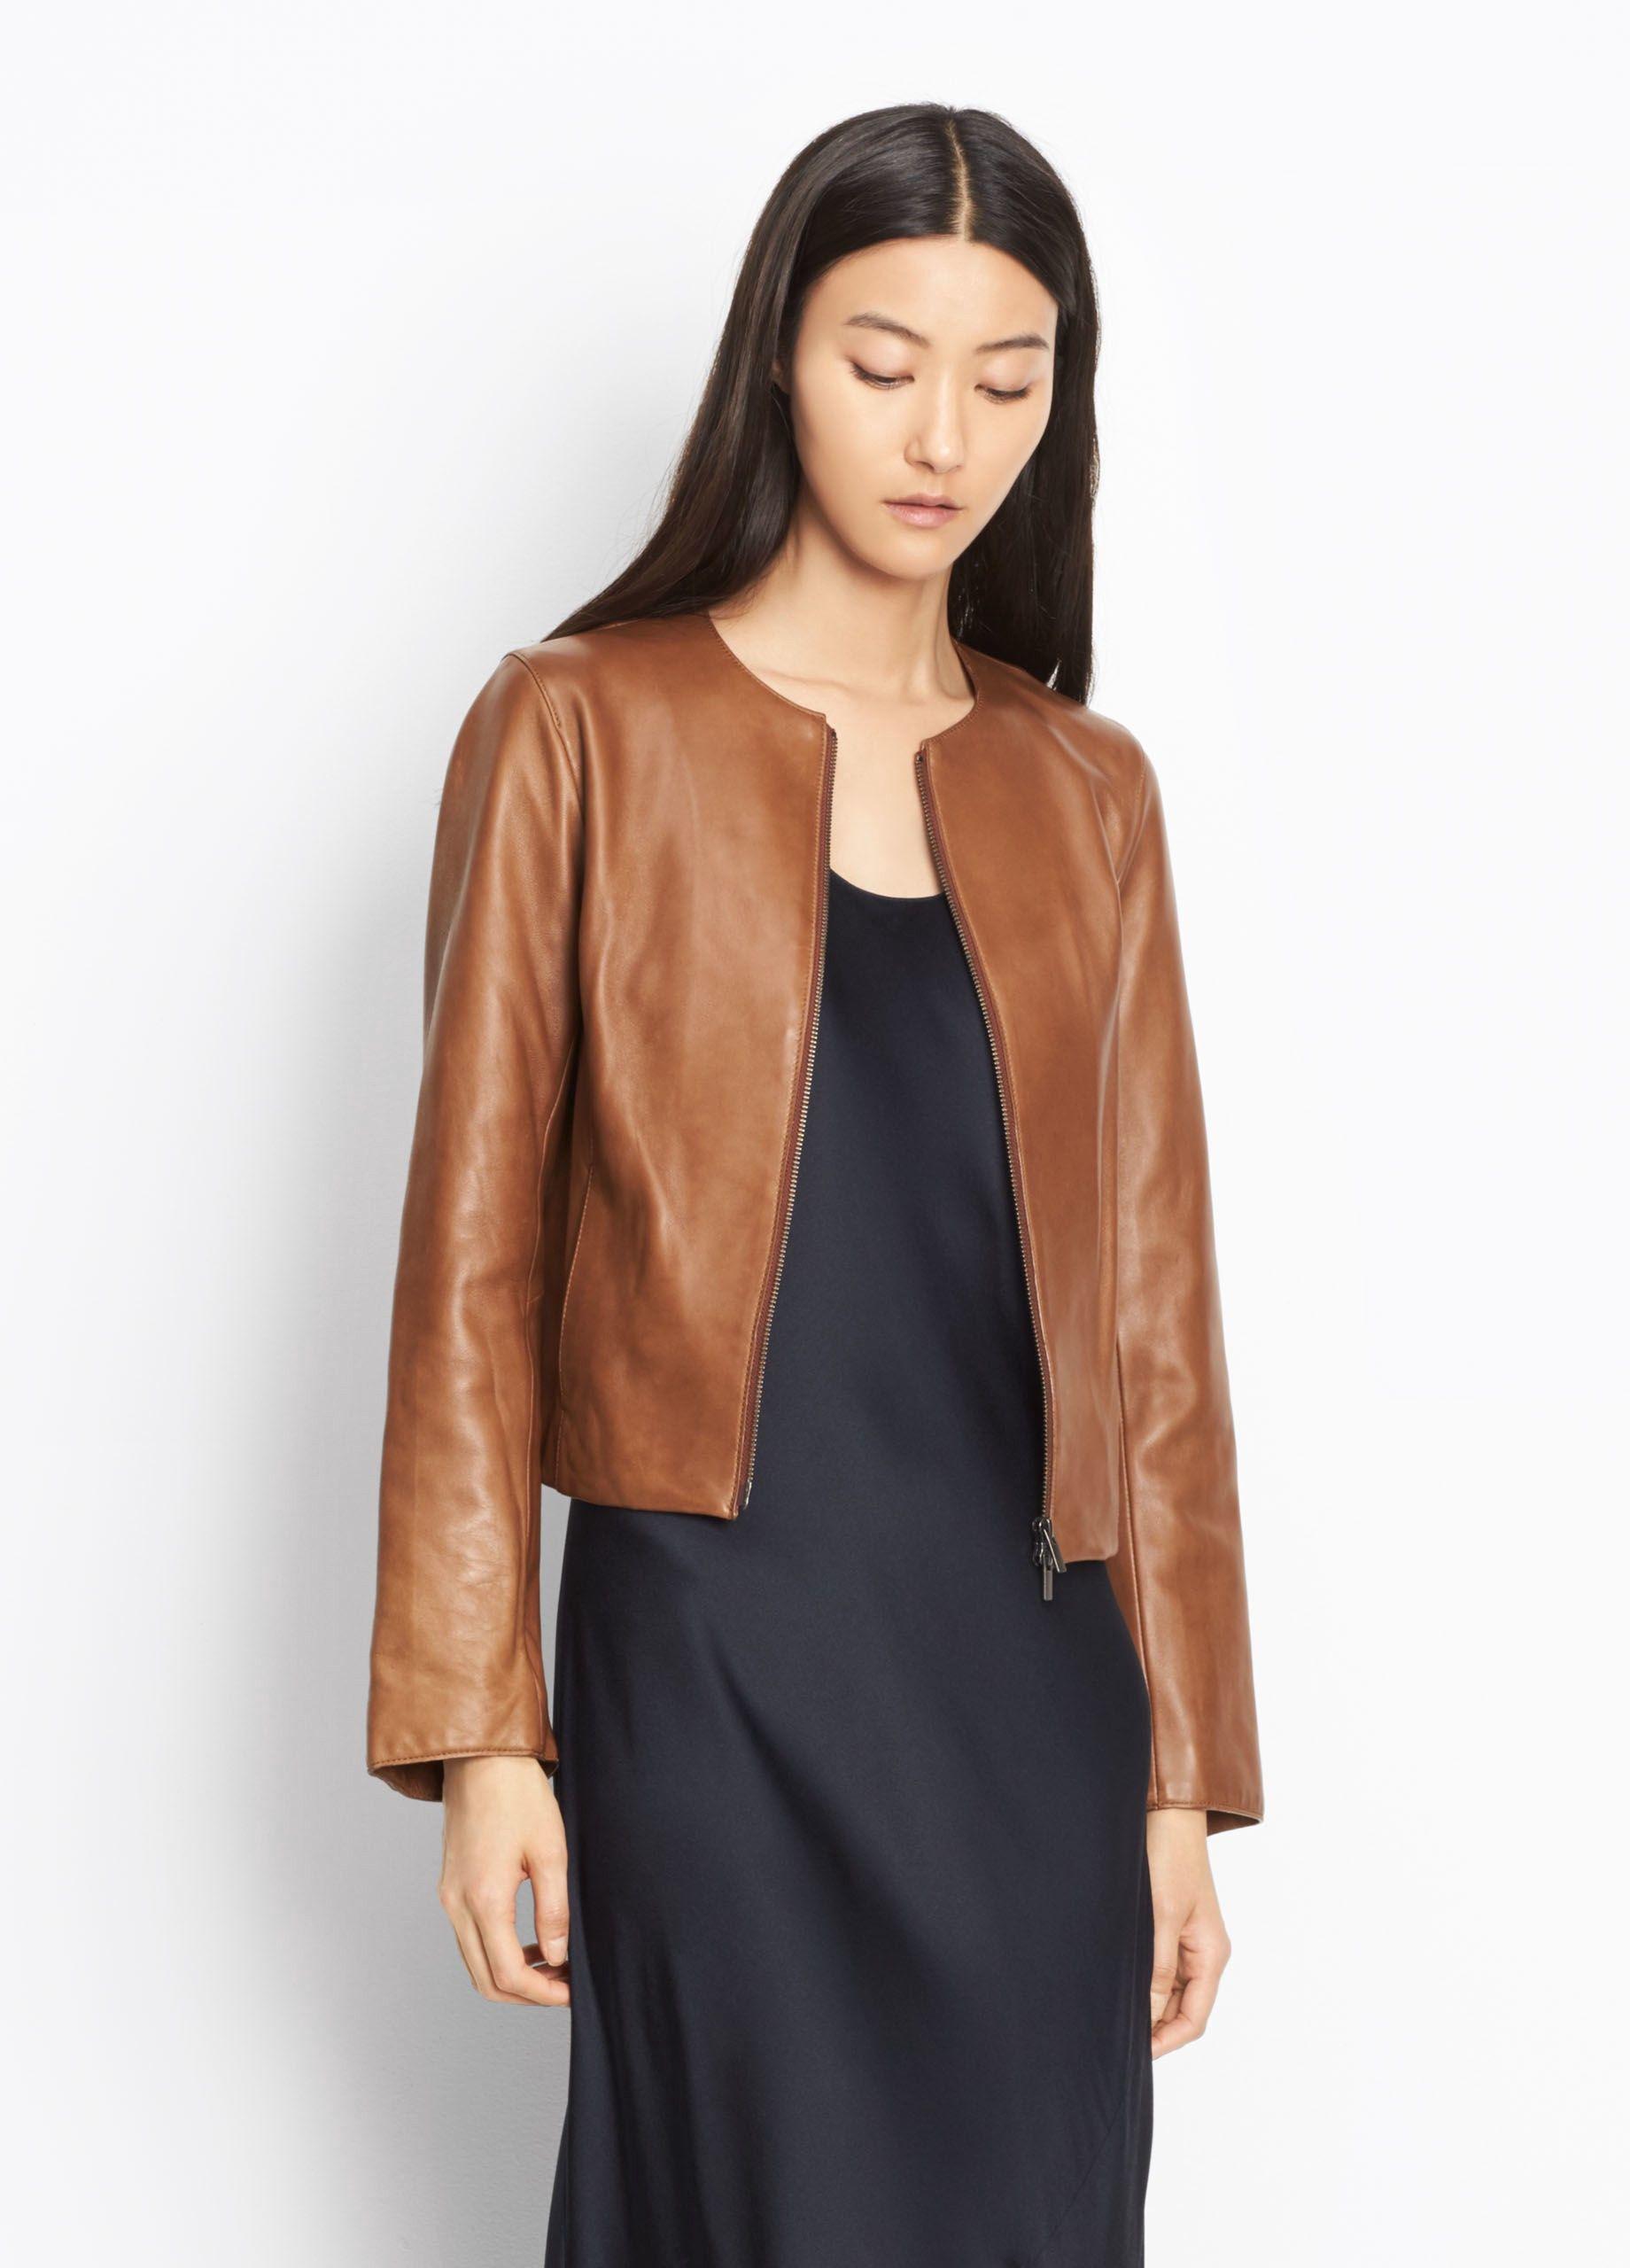 Vince Leather Jacket In Saddle Modesens Collarless Leather Jacket Jackets For Women Edgy Leather Jacket [ 2560 x 1840 Pixel ]